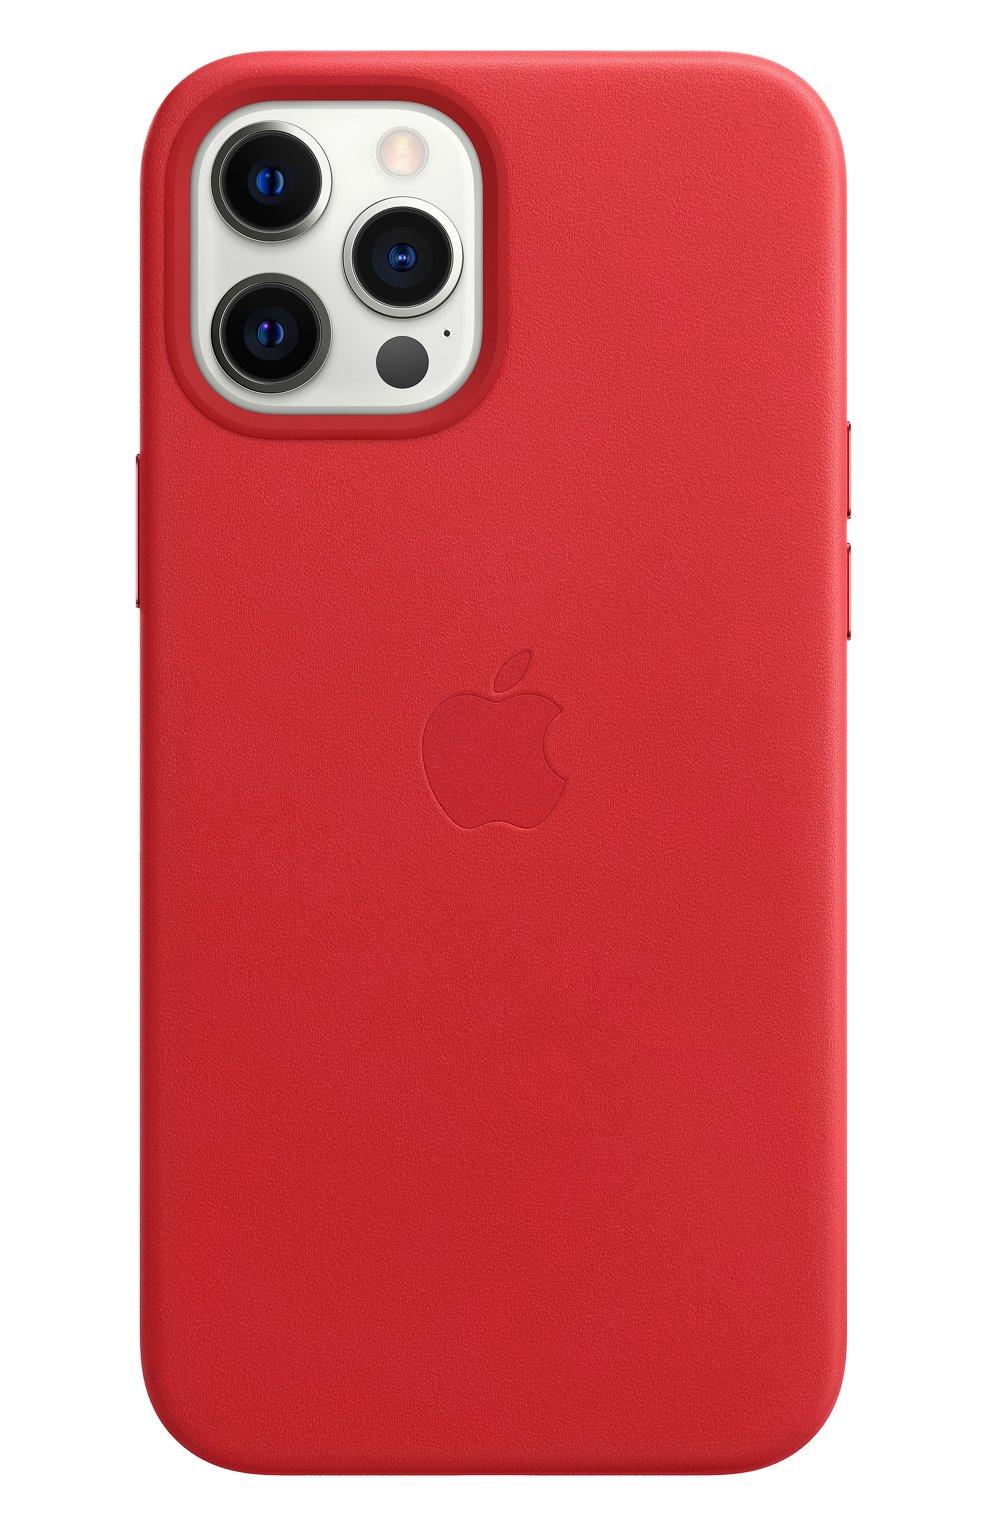 Чехол magsafe для iphone 12 pro max APPLE  (product)red цвета, арт. MHKJ3ZE/A | Фото 2